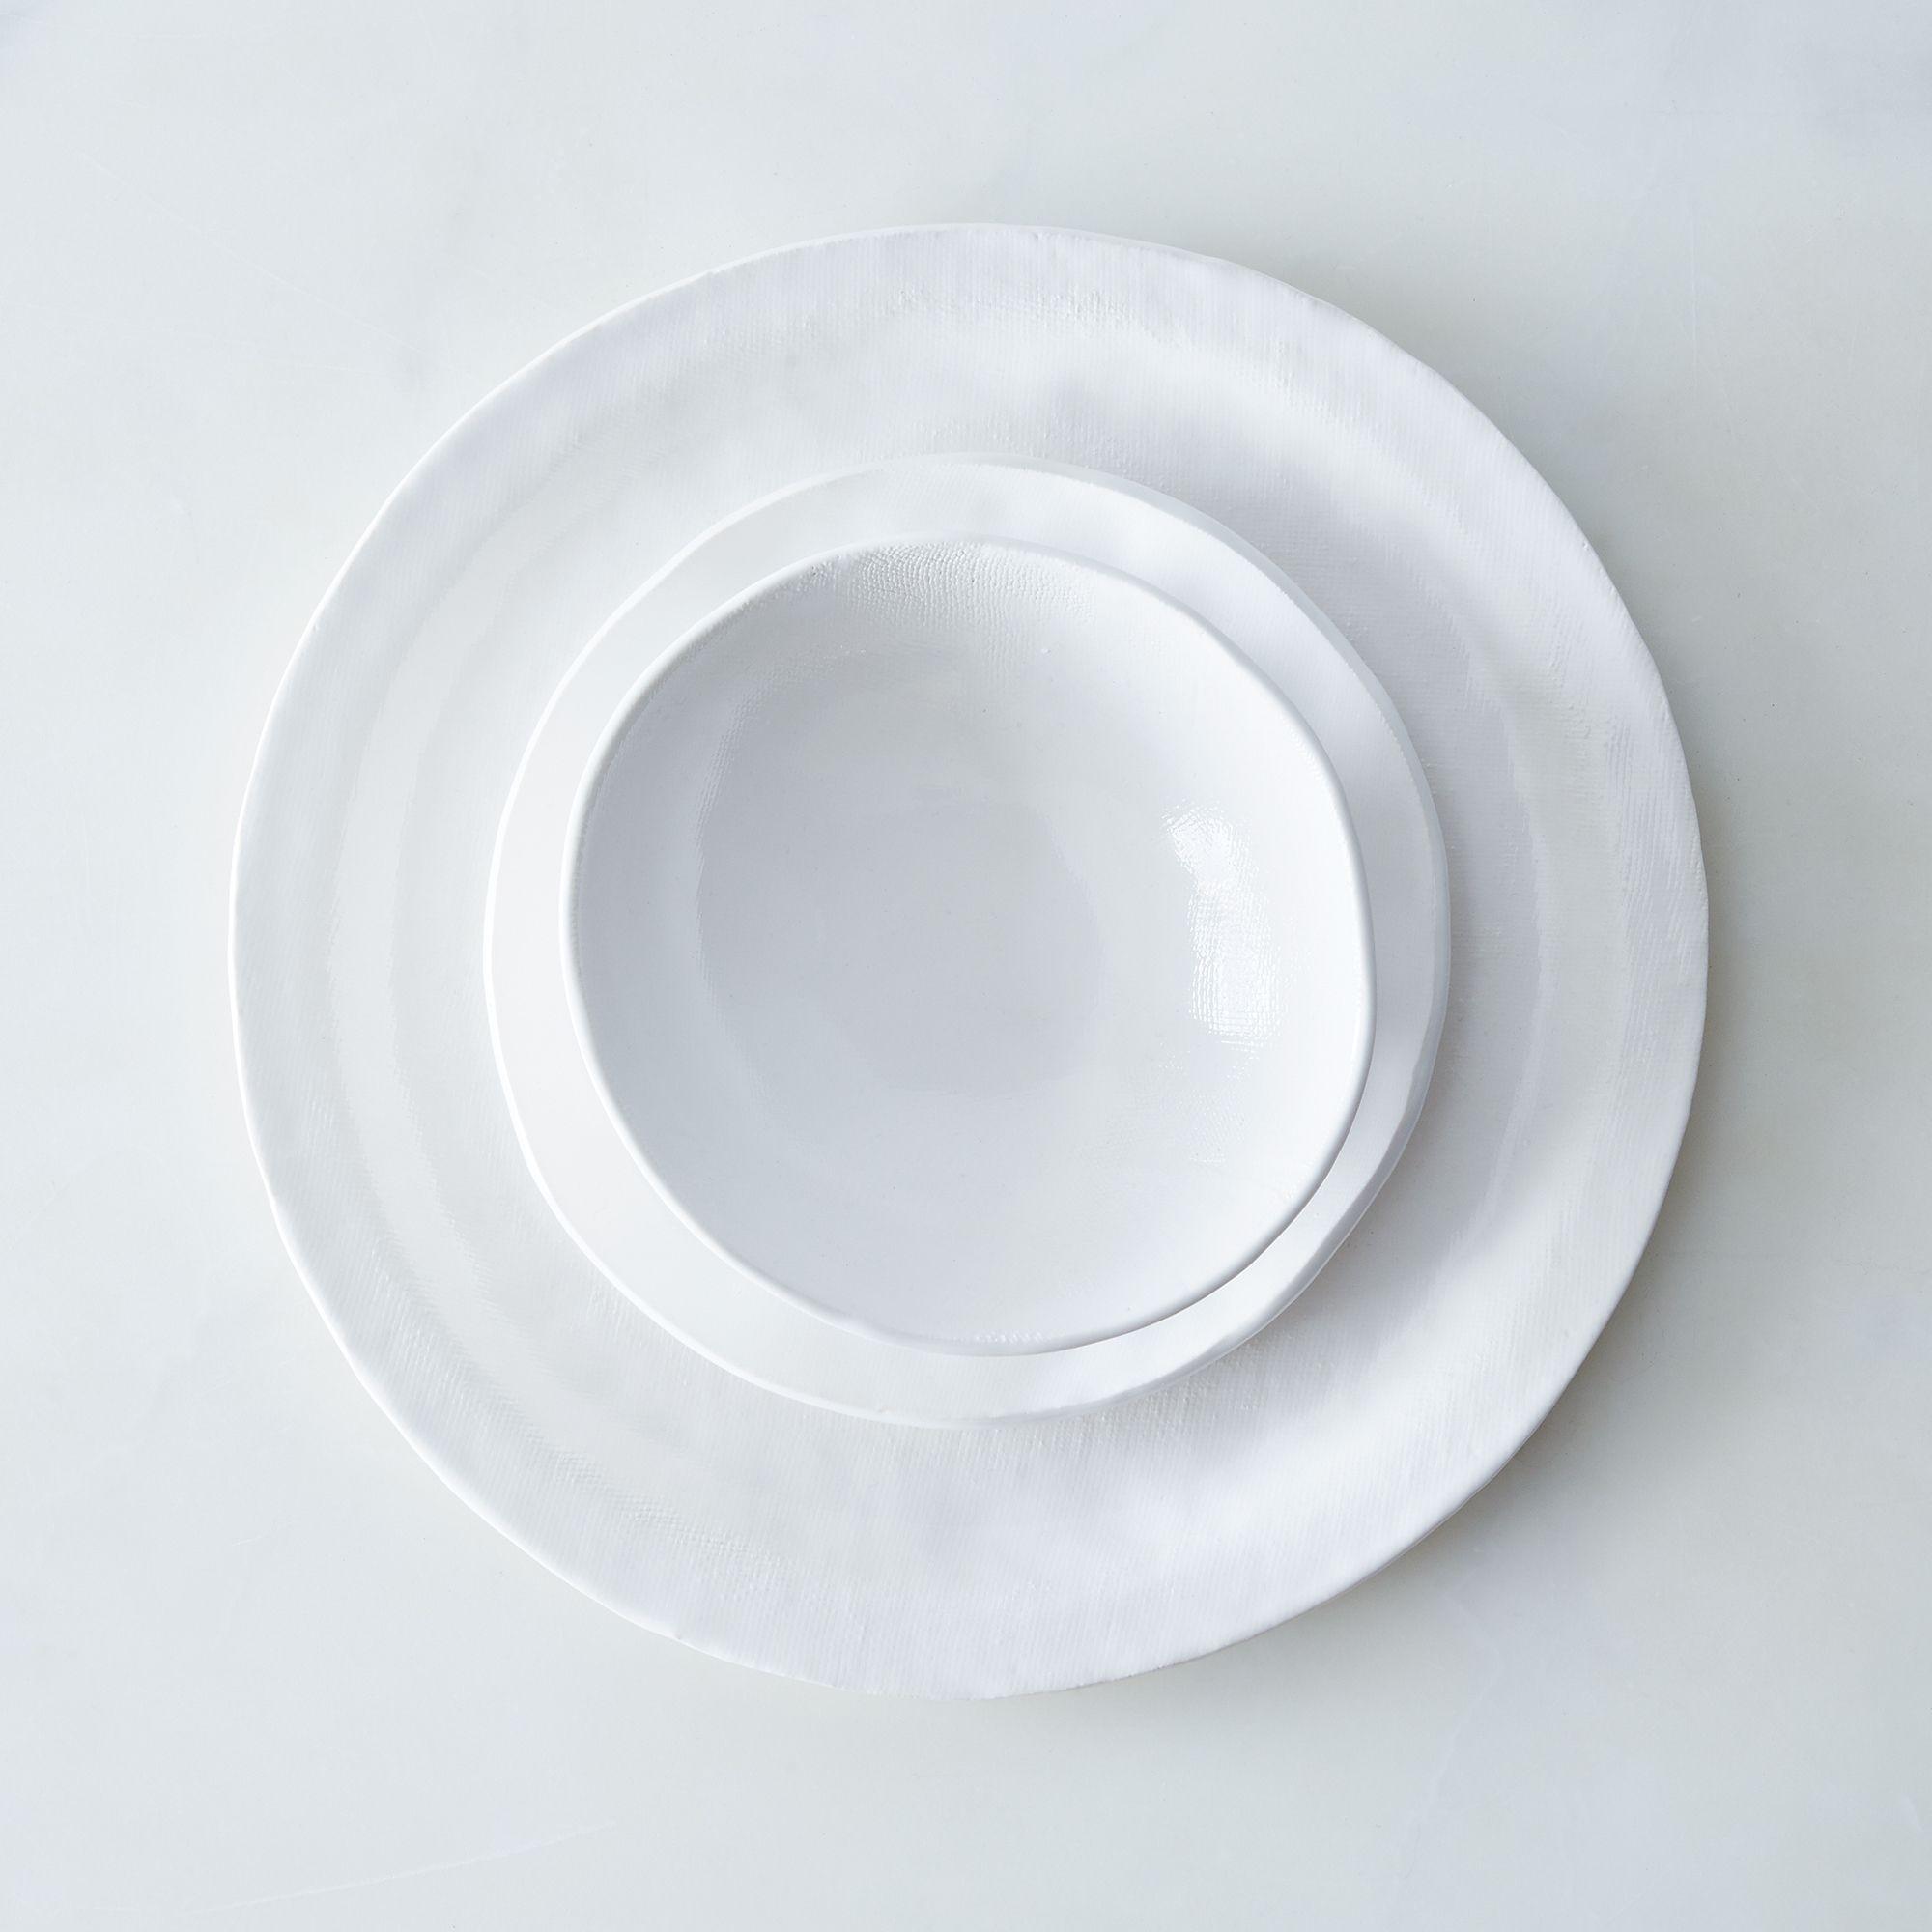 8b723f06 a0f8 11e5 a190 0ef7535729df  2015 0622 looks like white handmade porcelain textured dinnerware 3 piece set silo james ransom 001